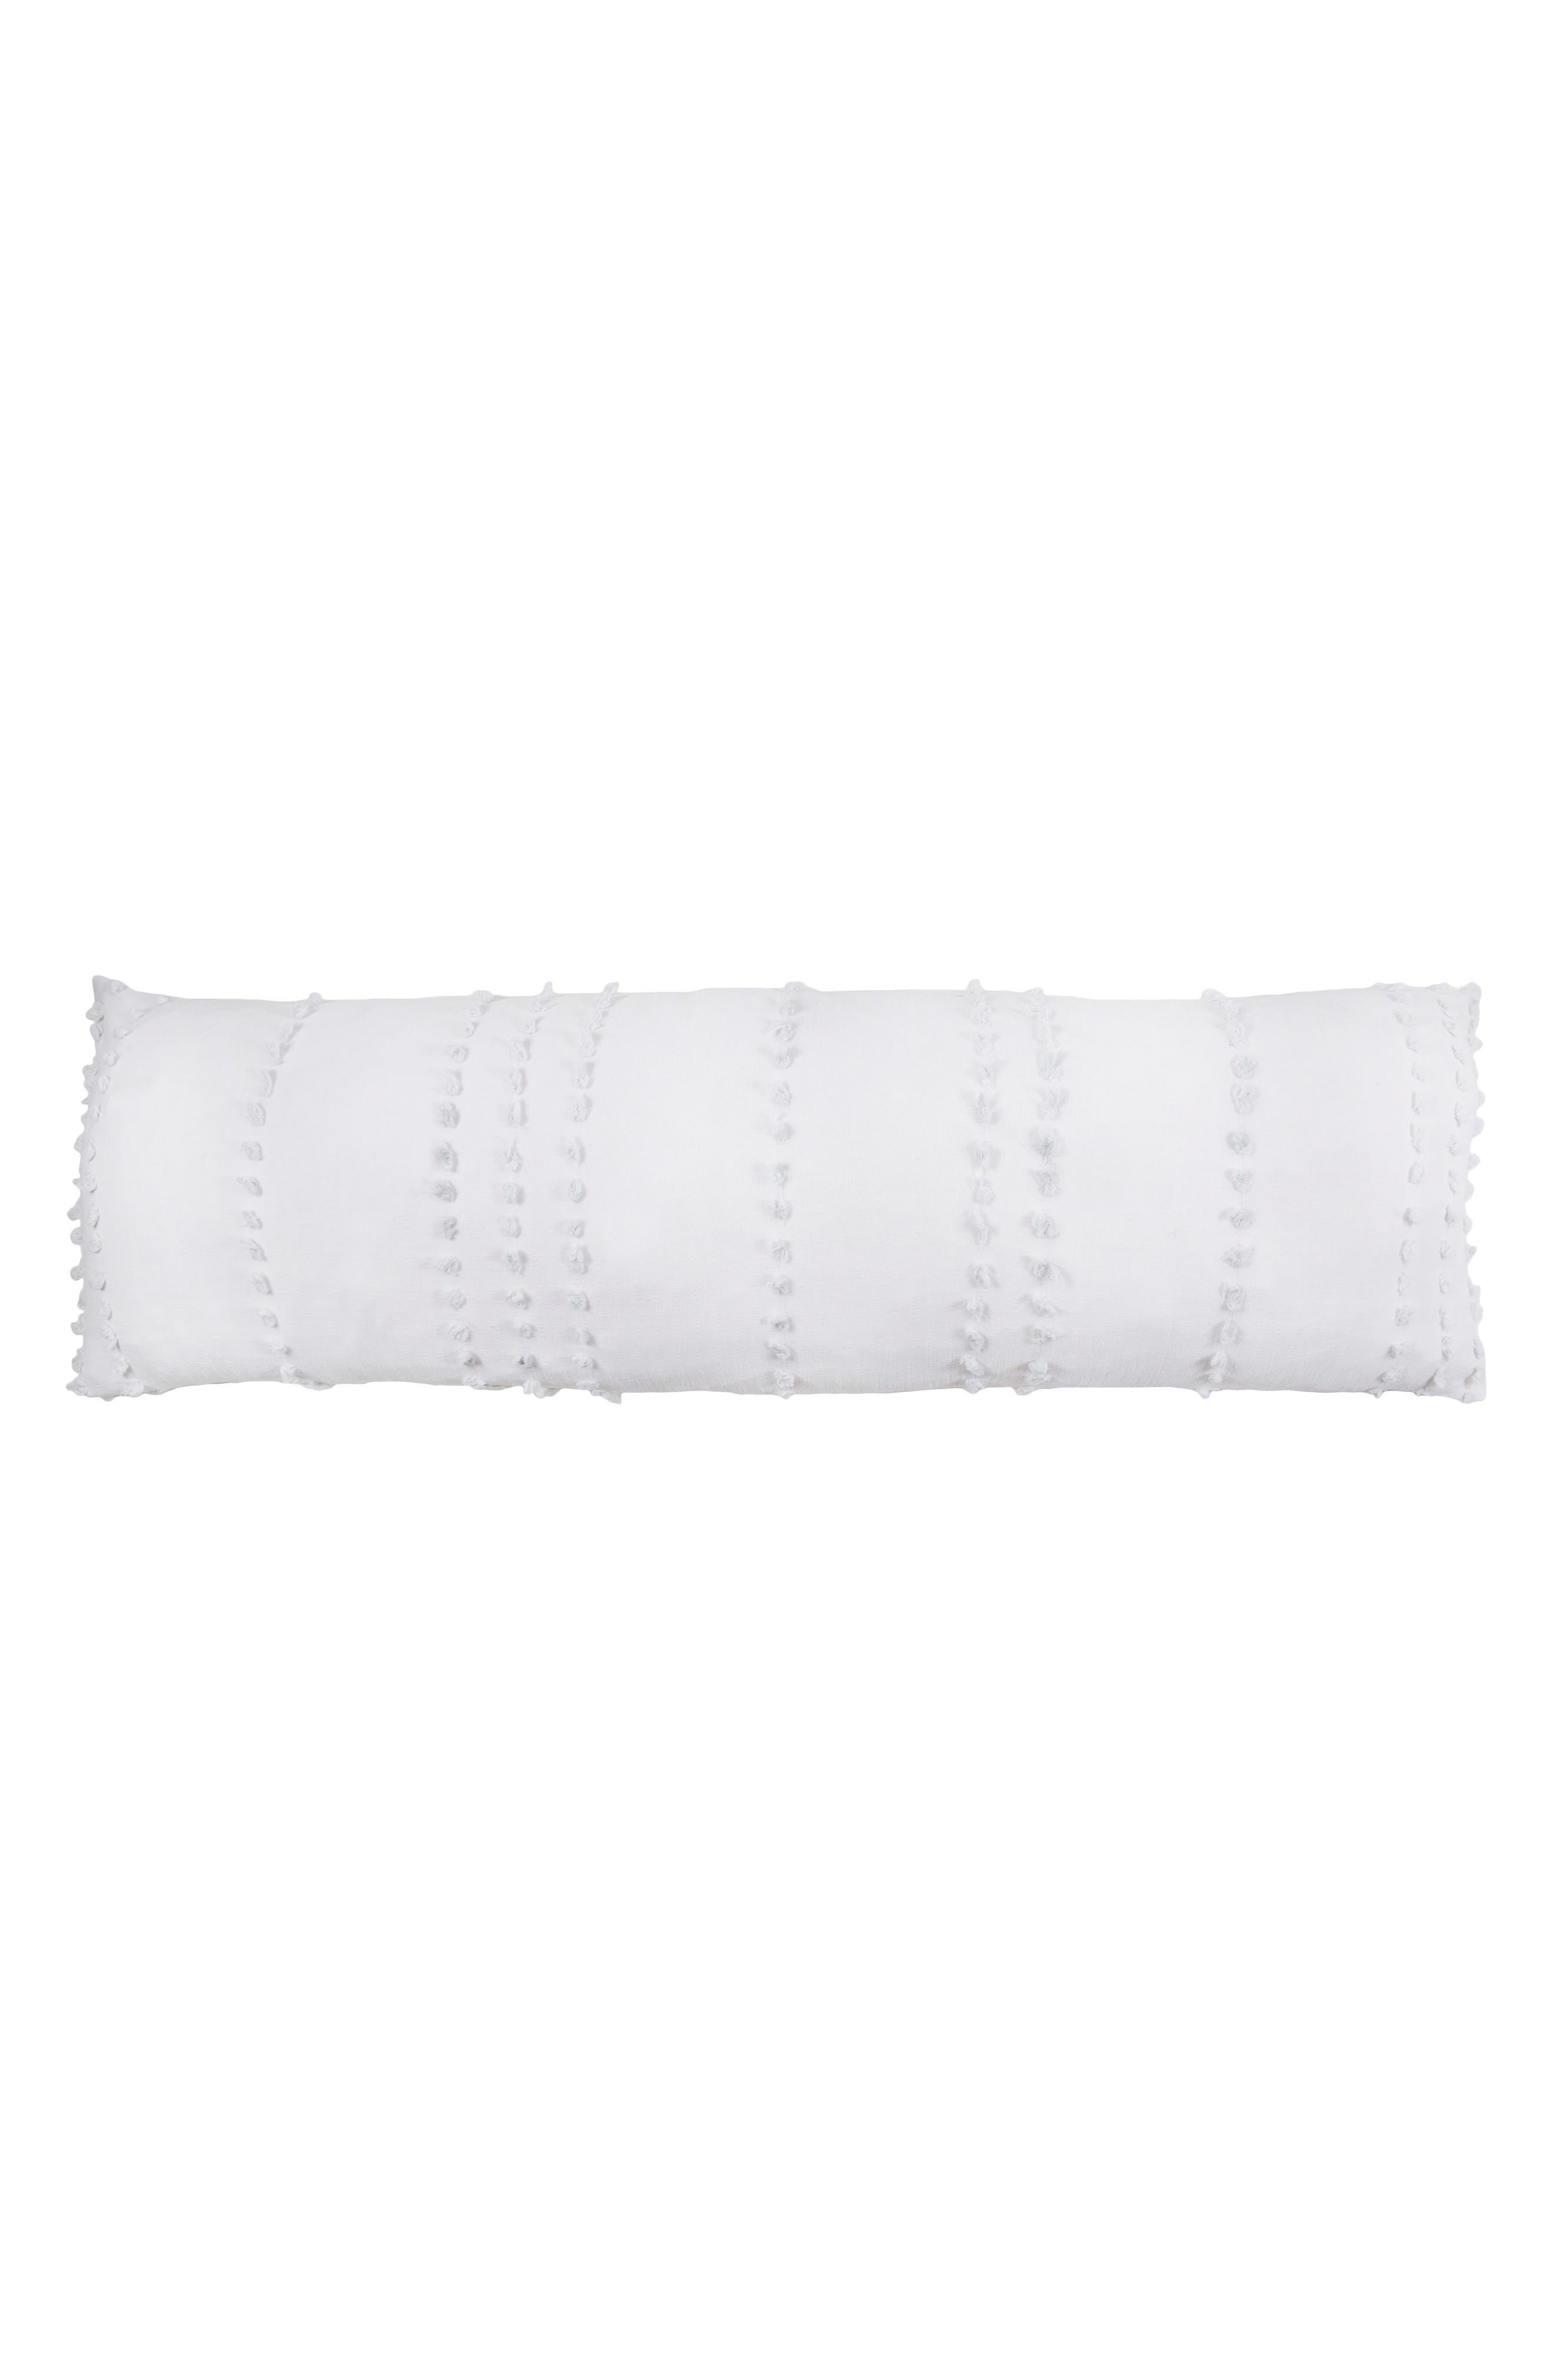 Poppy Body Pillow,                         Main,                         color, White/ Barely Blue